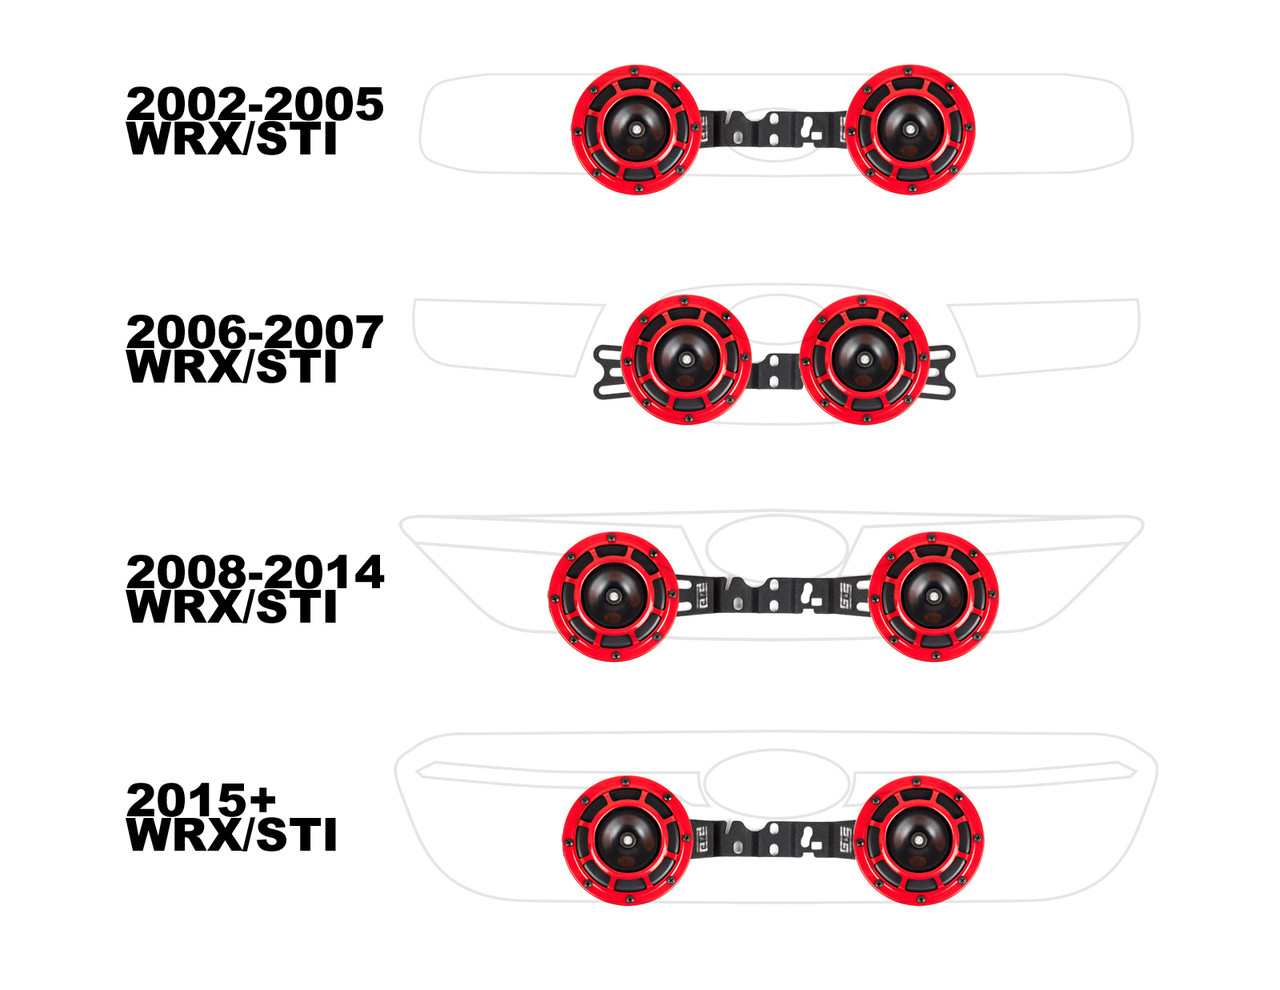 Grimmspeed Brotie Mounting Bracket For Hella Horns 02 15 Wrx Sti 05 Grand Am Horn Wiring Harness Group Buy Nasioc